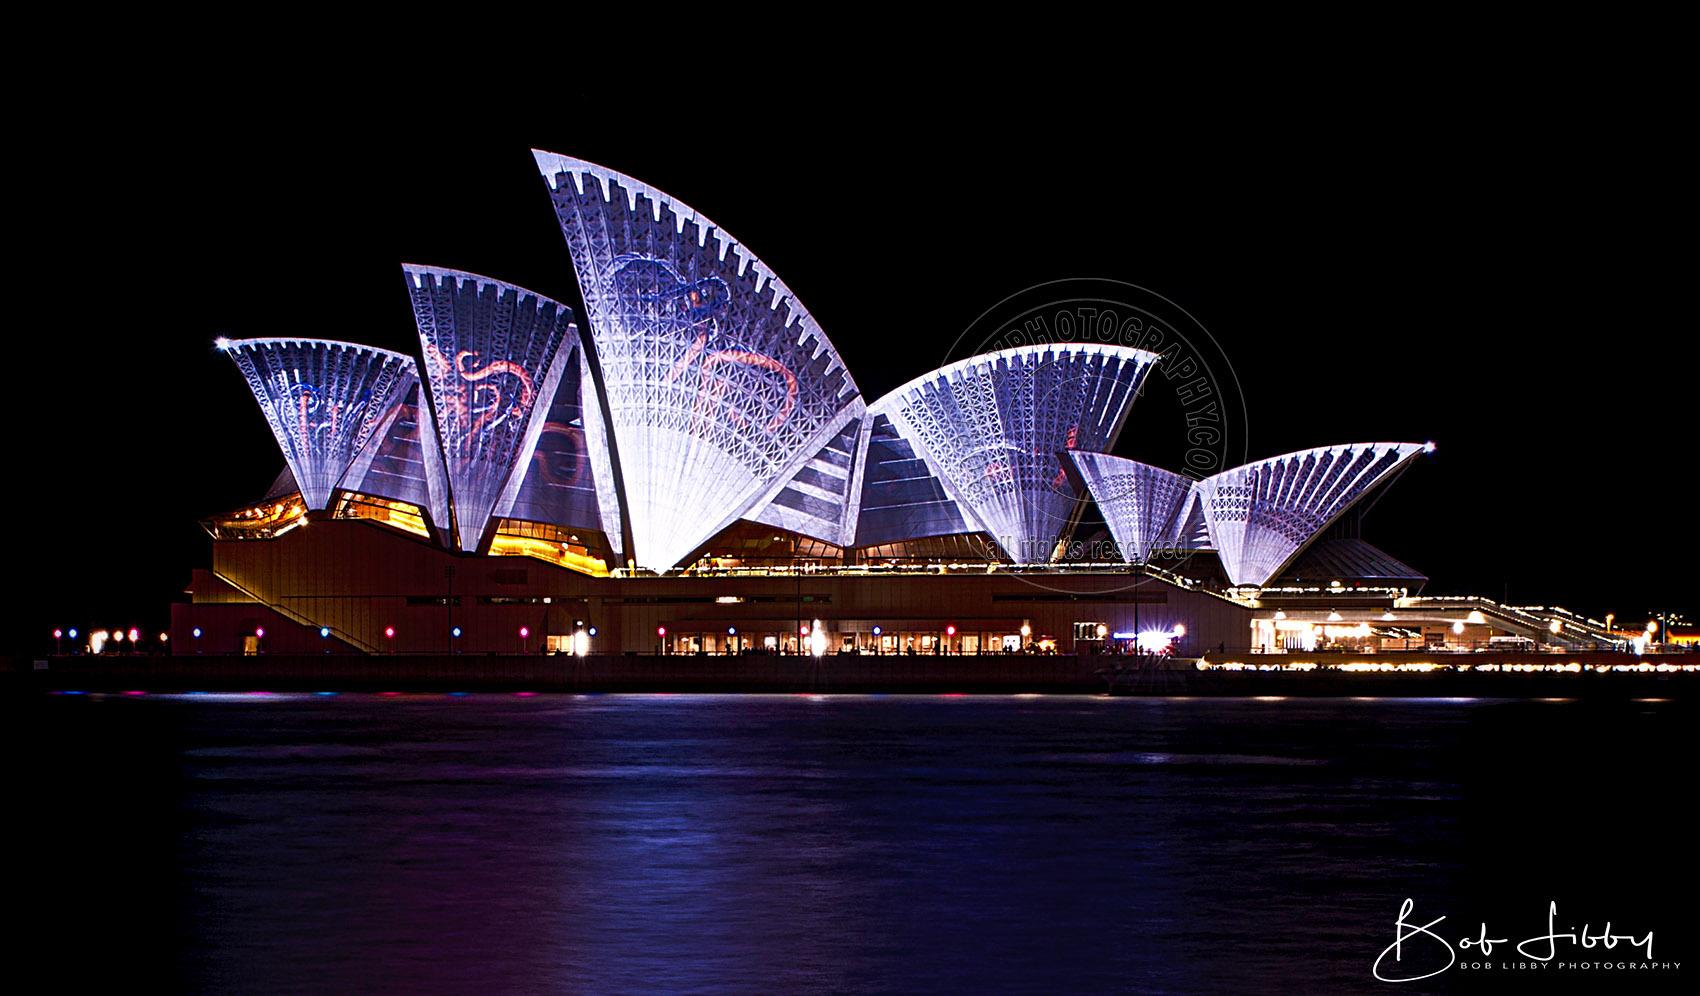 Opera House during Vivid Light Show